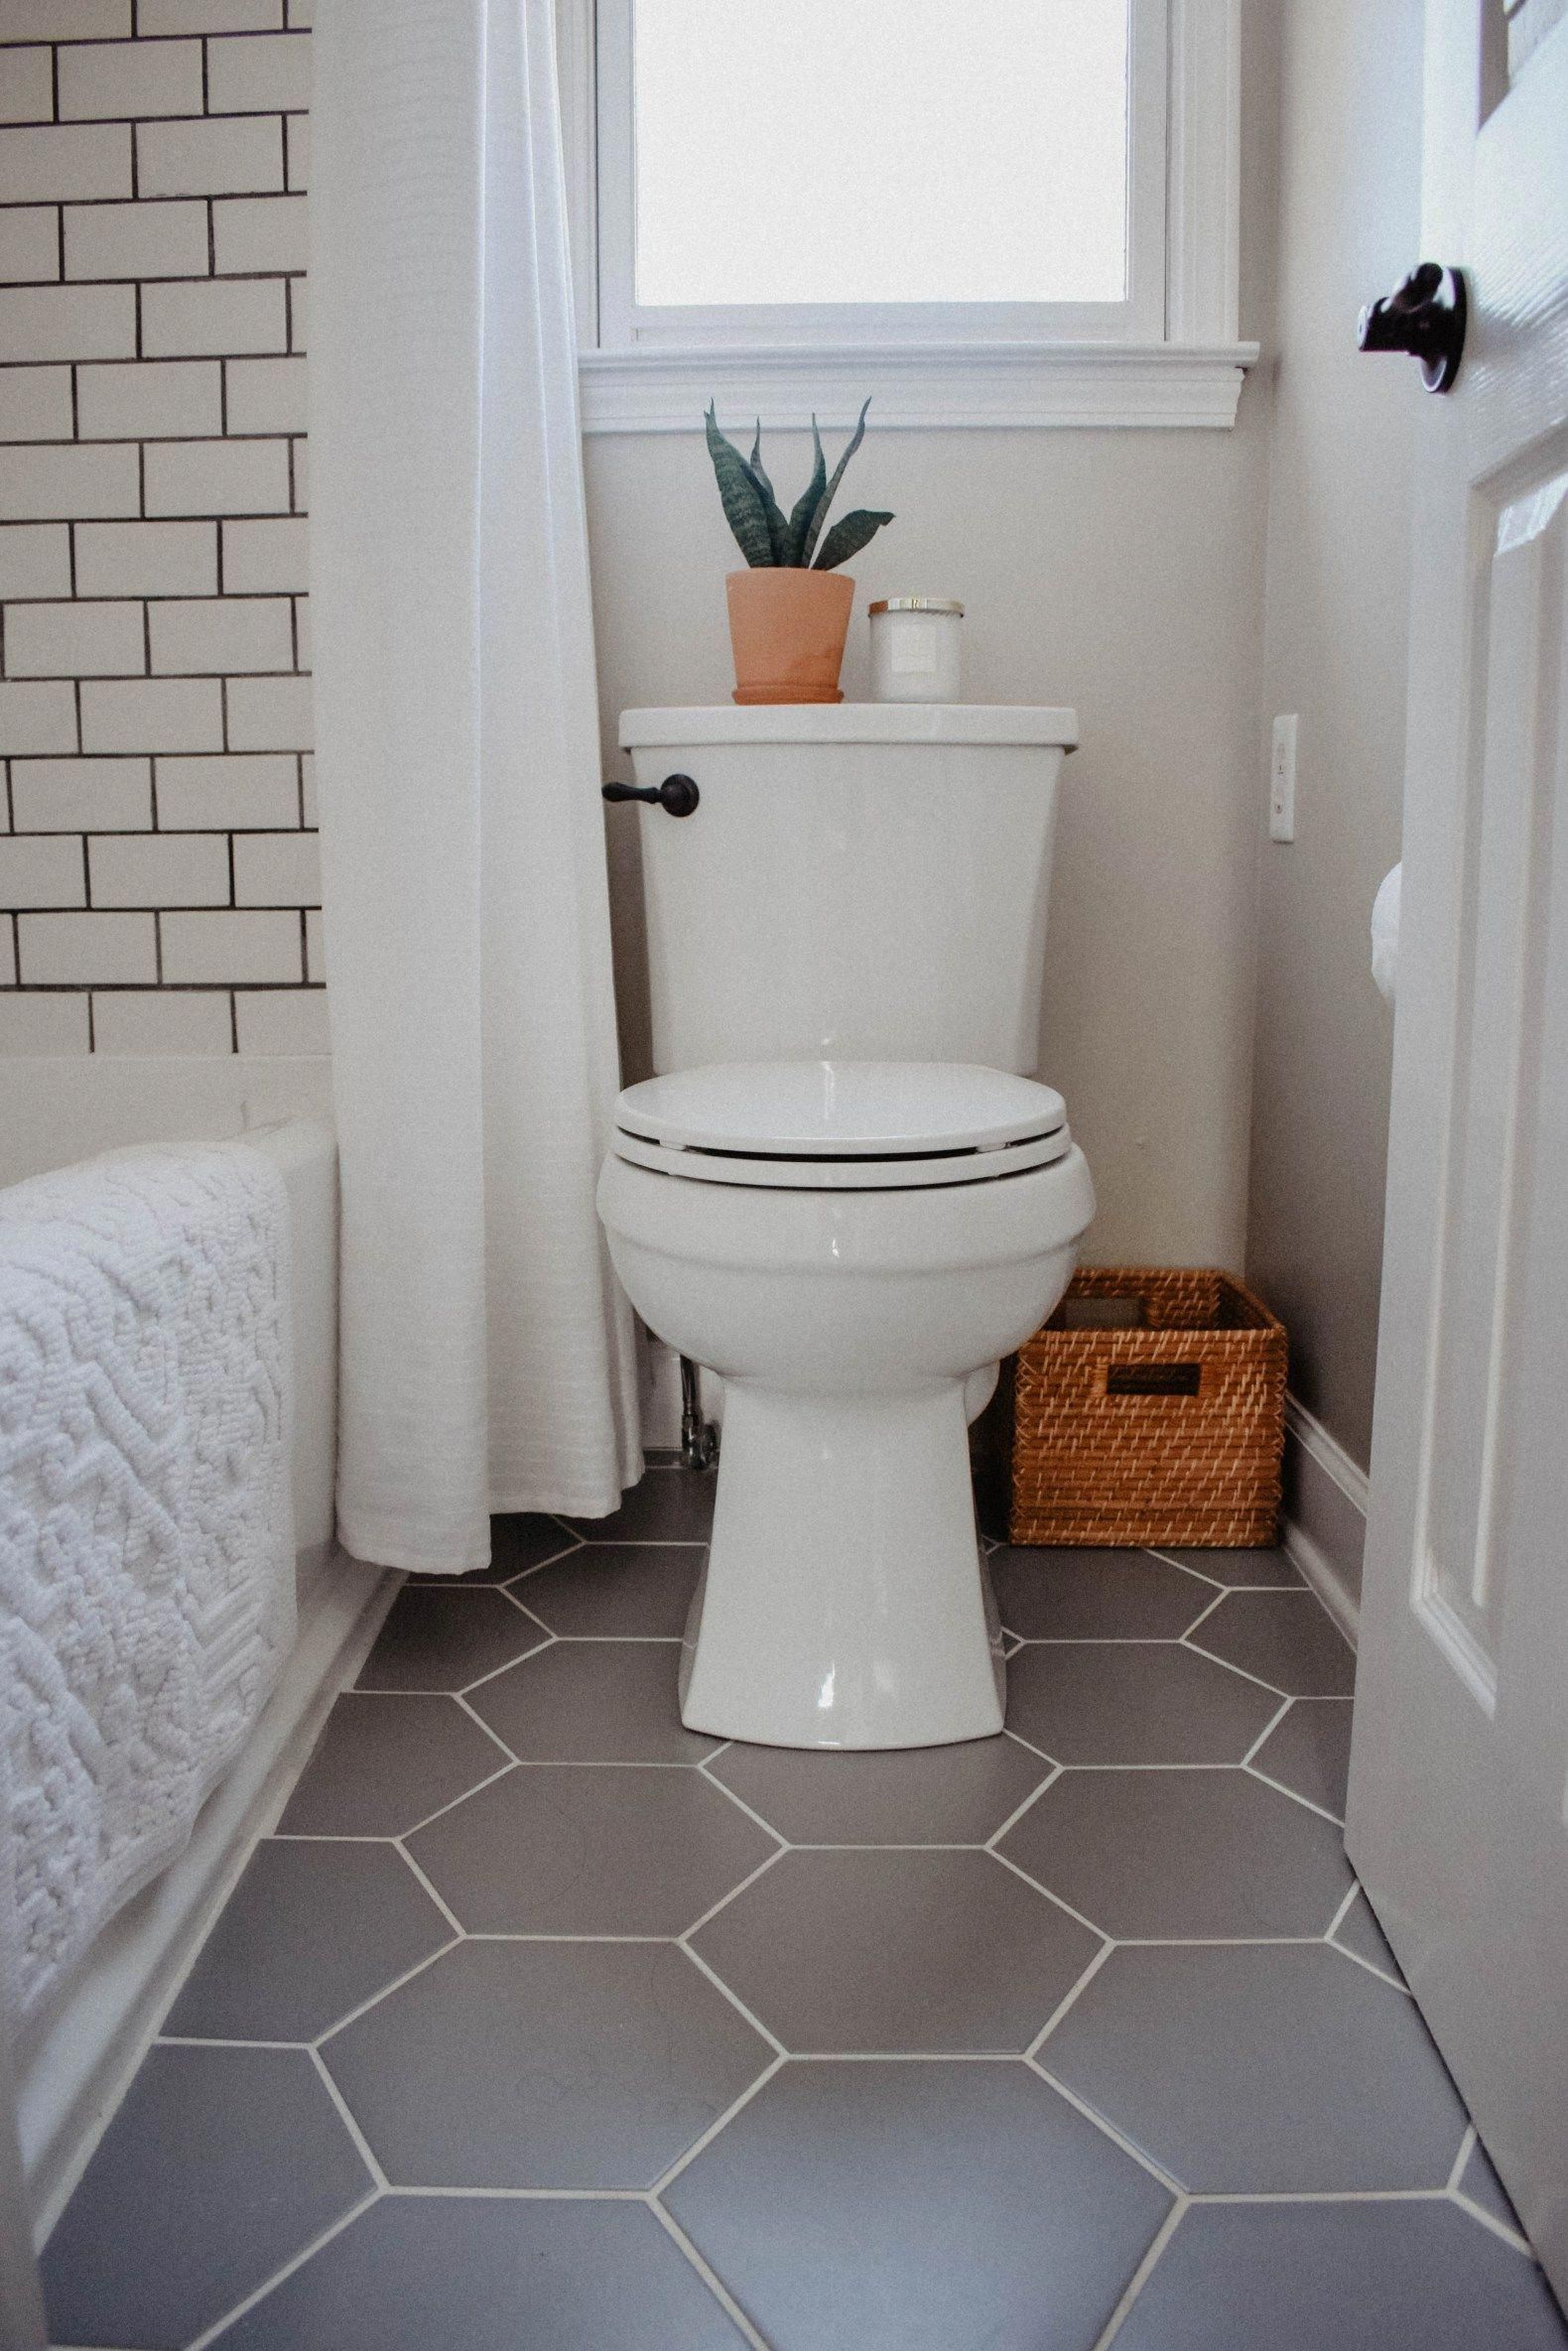 Bathroom Shower Set Italian Decor Where To Buy Toilet